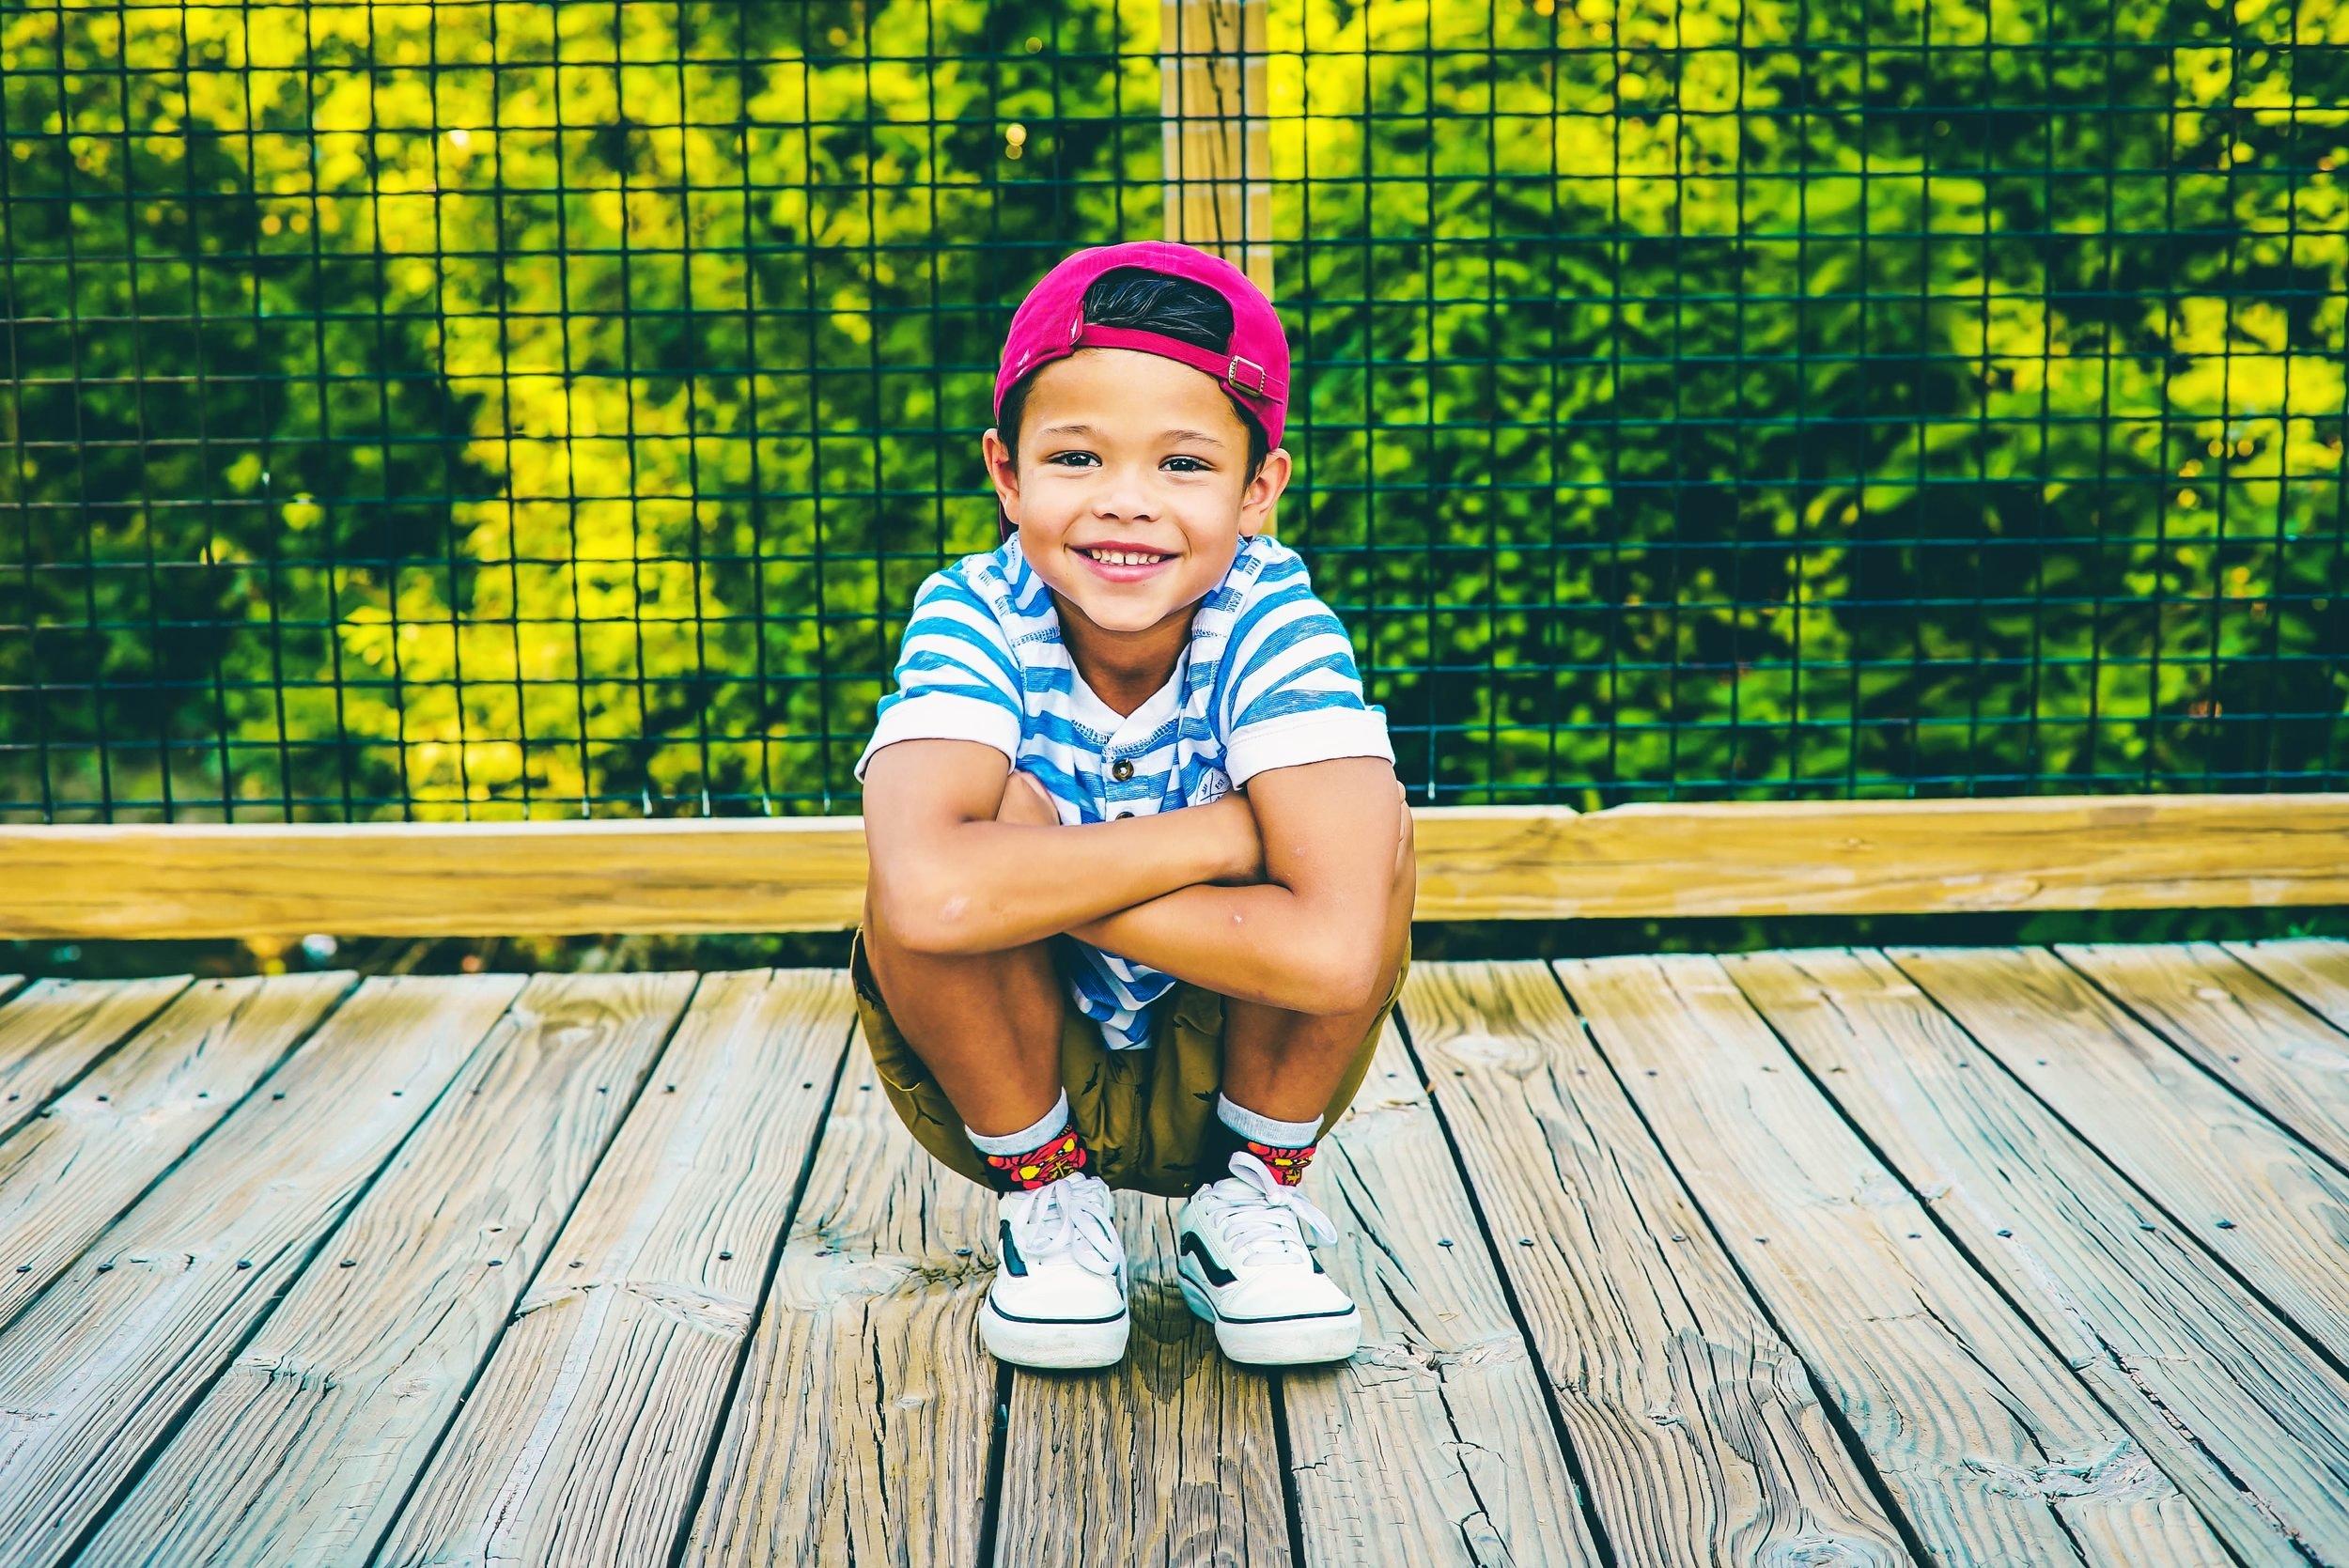 Child boy outside smiling decking